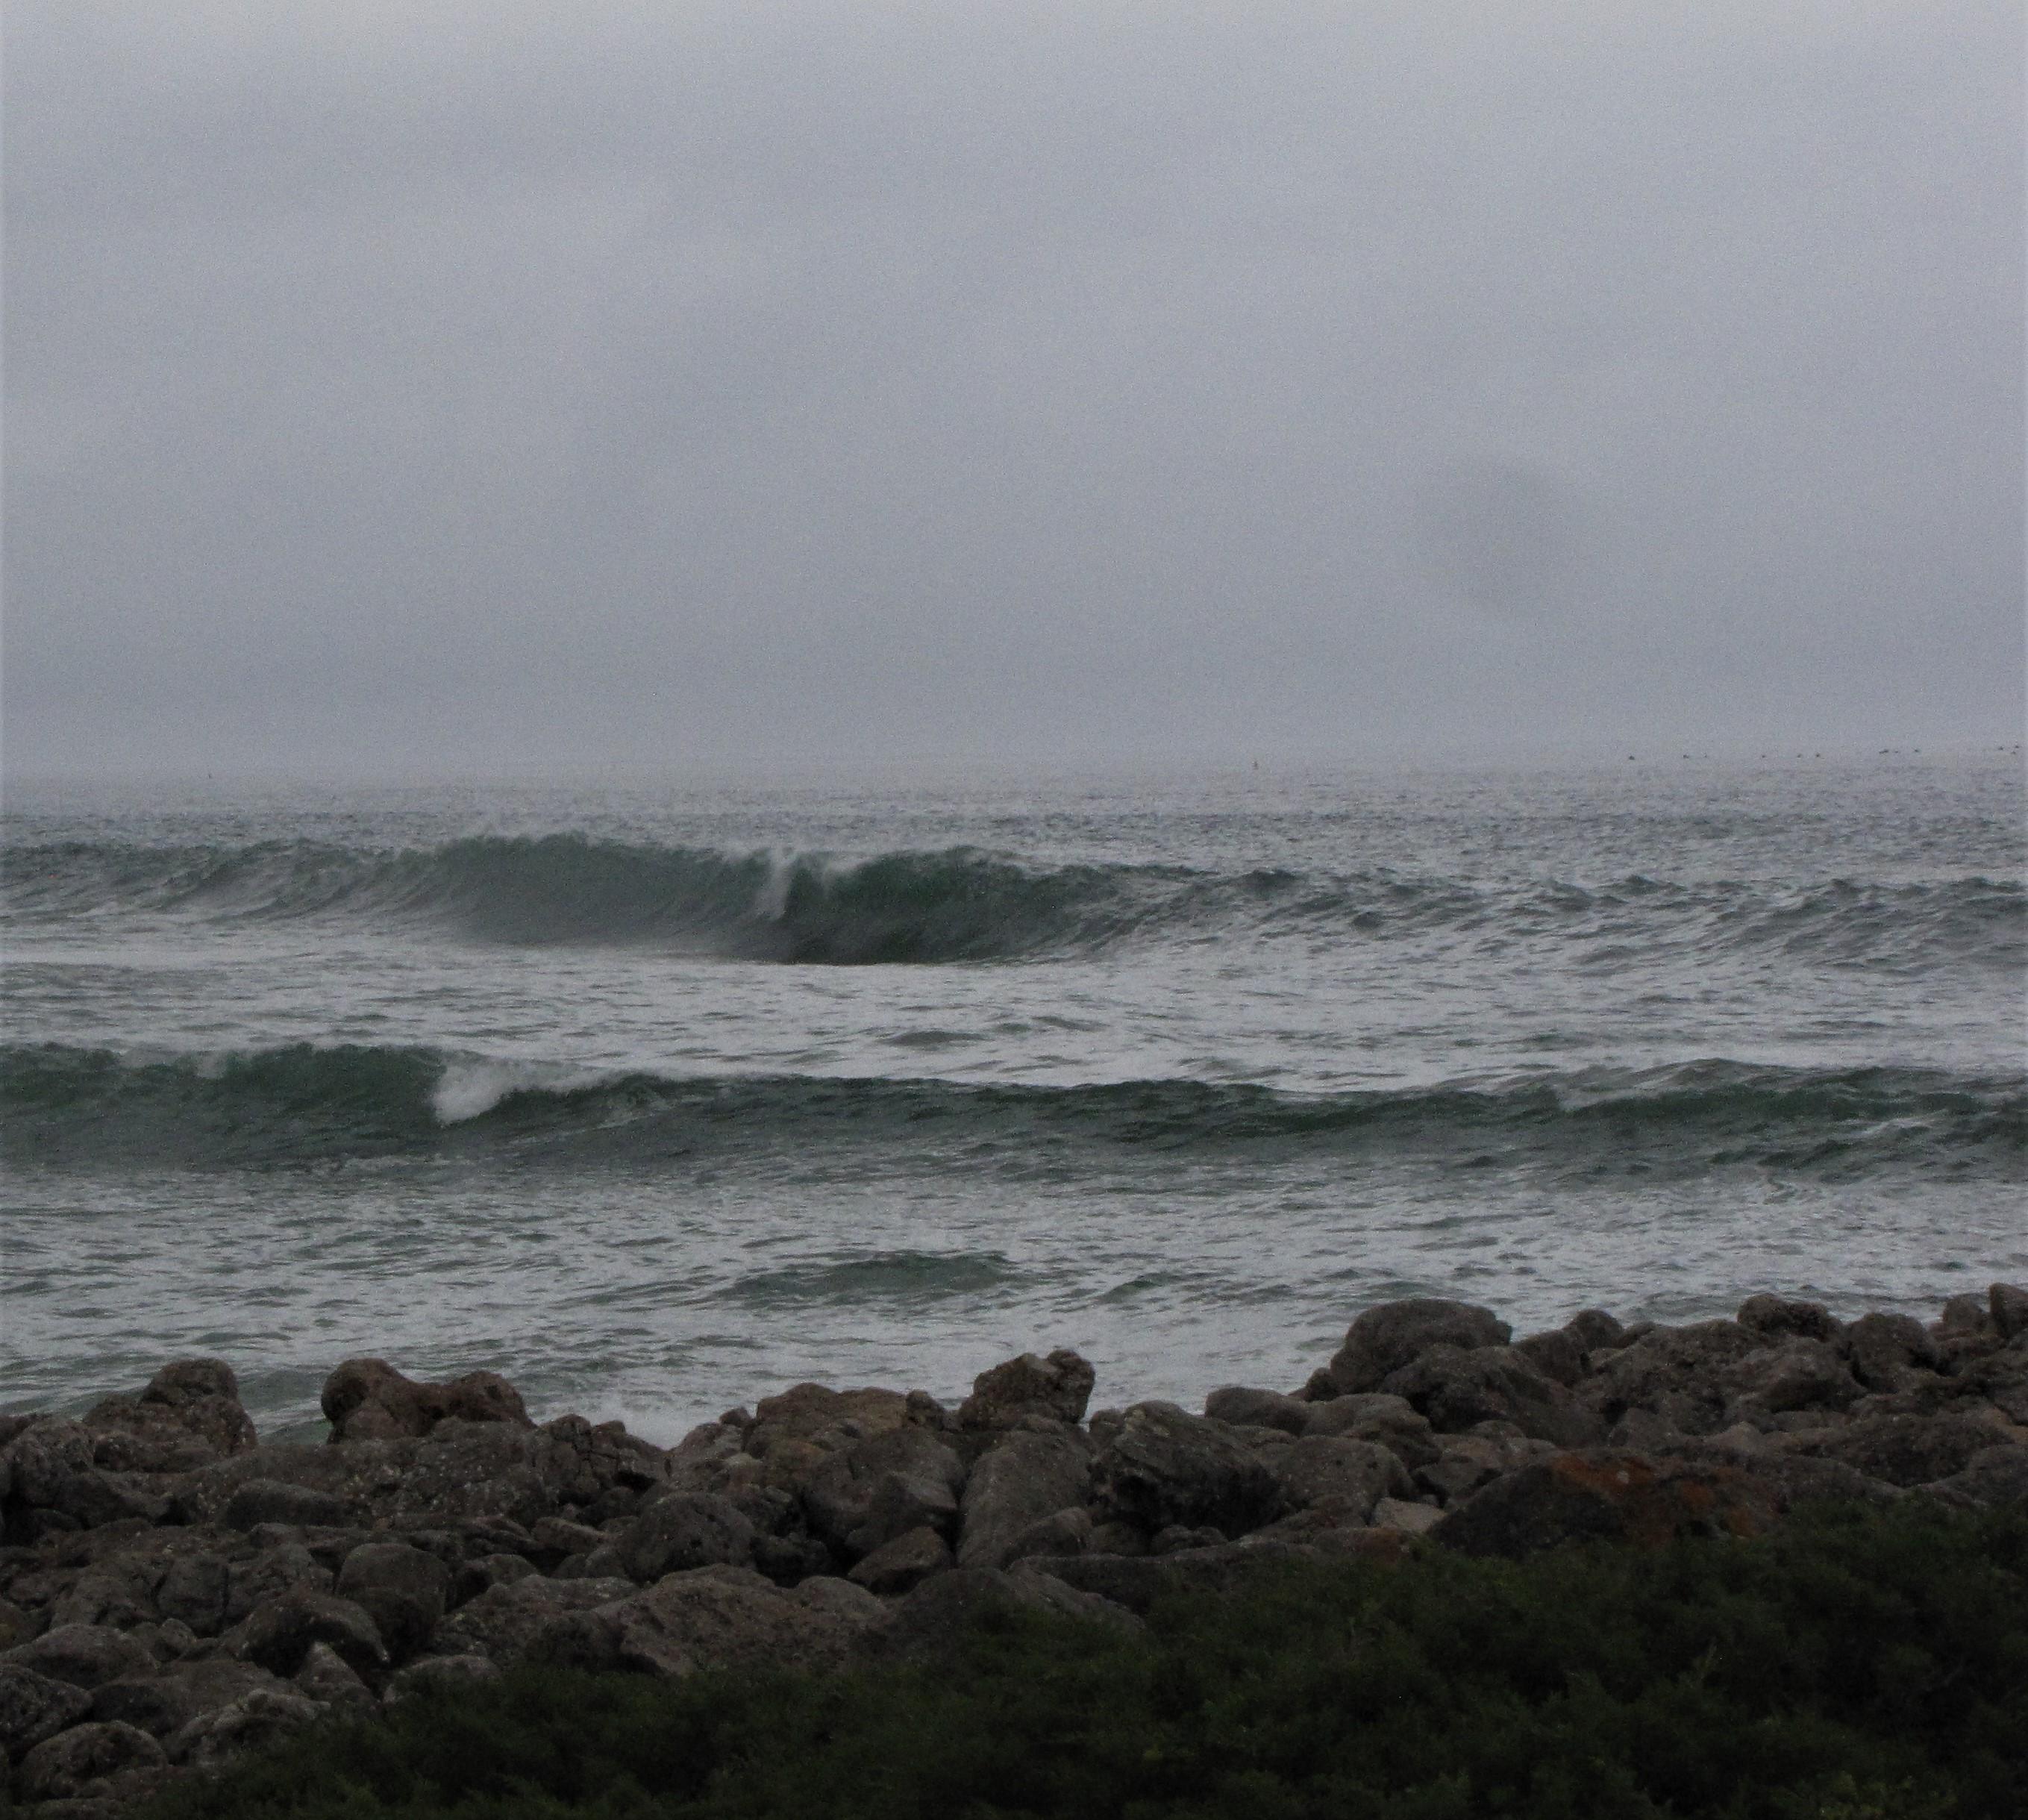 wave barrel movie style near zavial